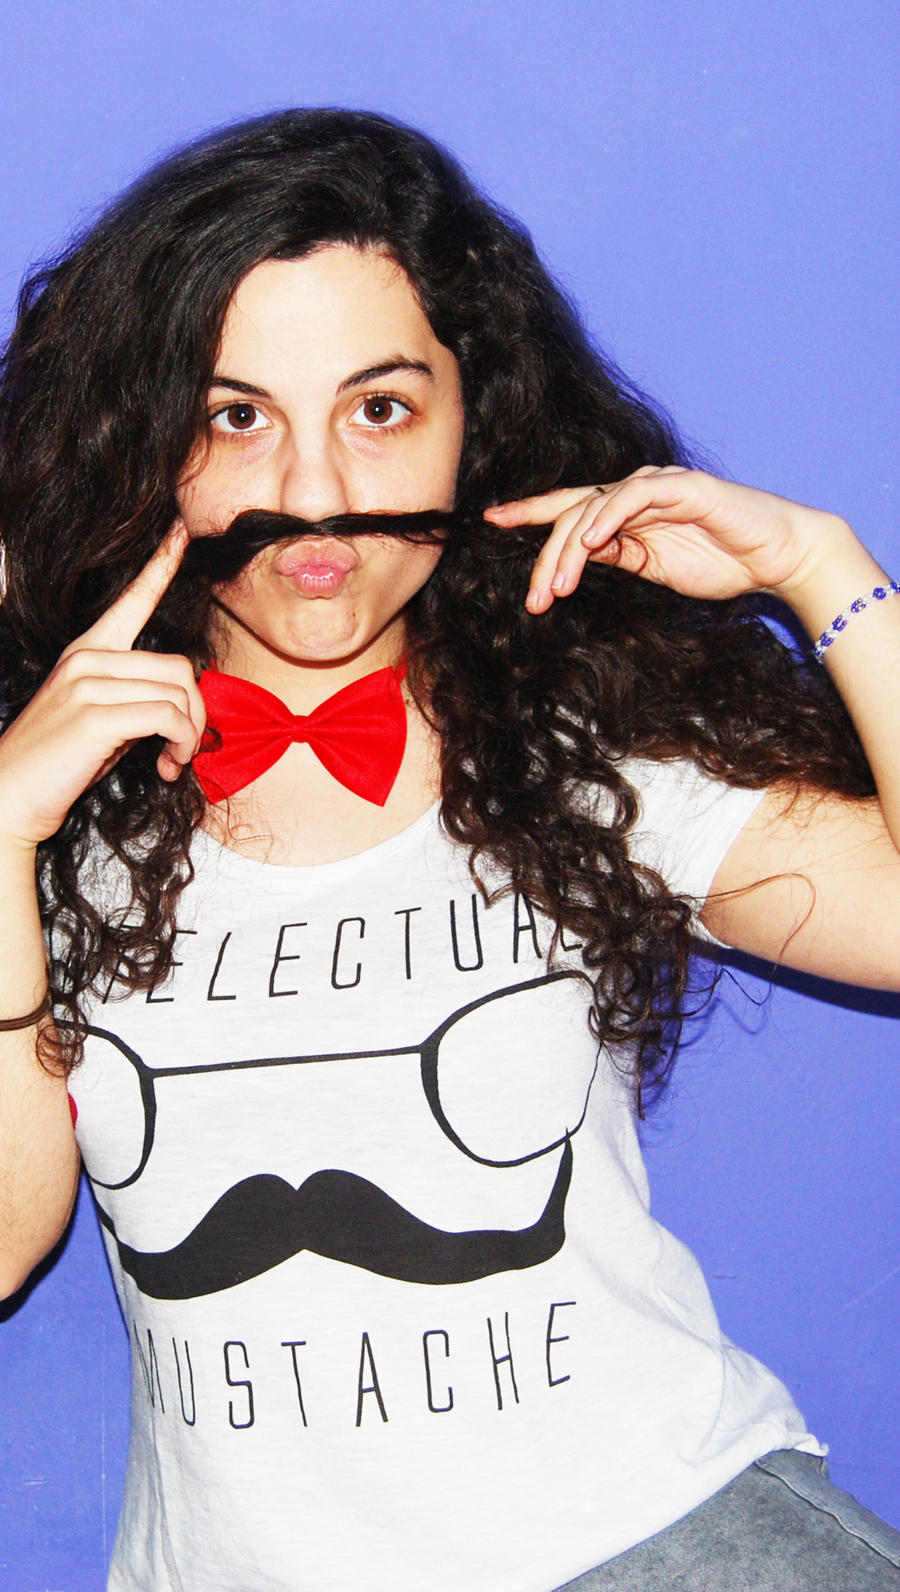 Mustache by Albarose7